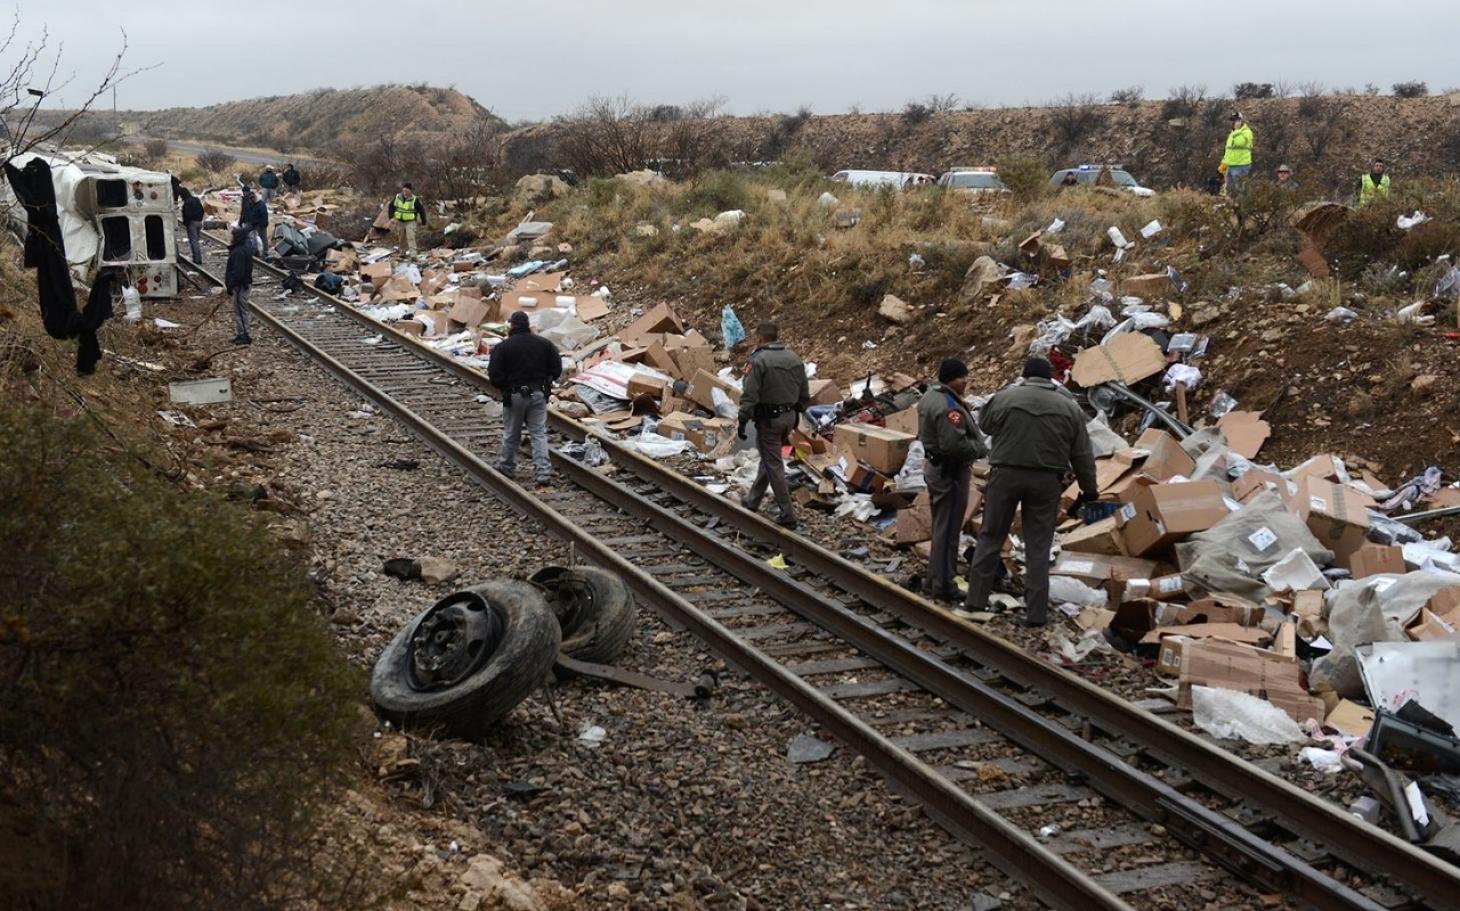 Texas prison bus skids into train, leaving at least 10 dead   Al